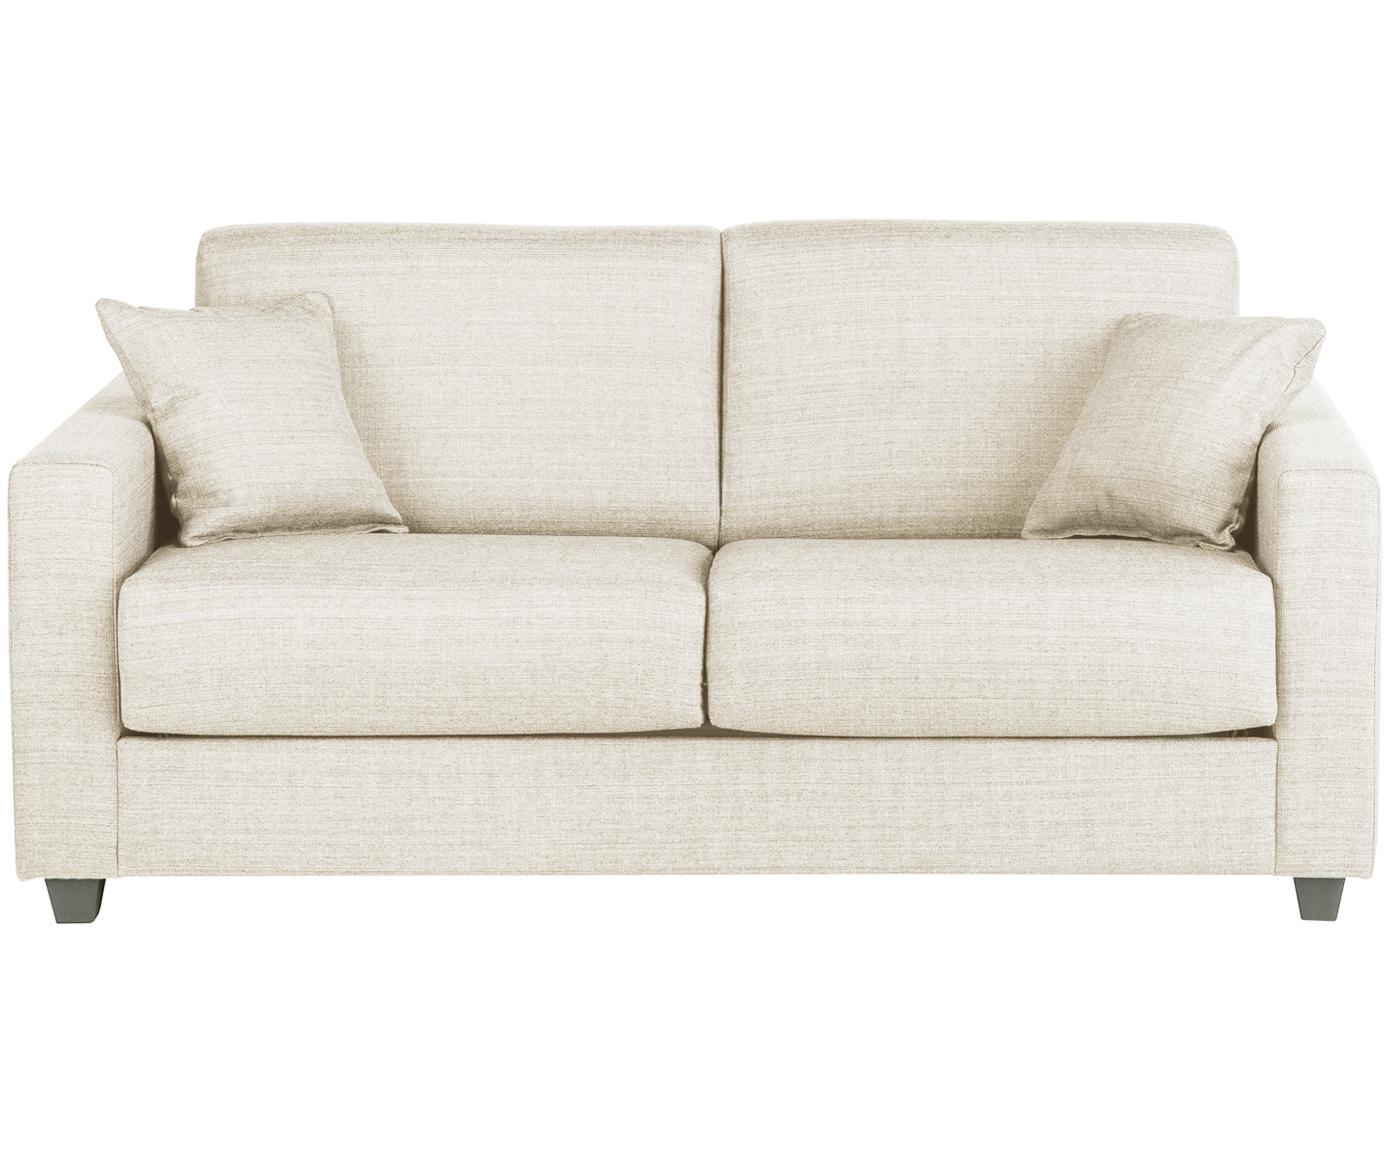 Sofá cama Maria, Tapizado: 40%algodón, 20%lino, 20, Patas: plástico, Estructura: tablero de fibras de dens, Crema, An 180 x F 97 cm